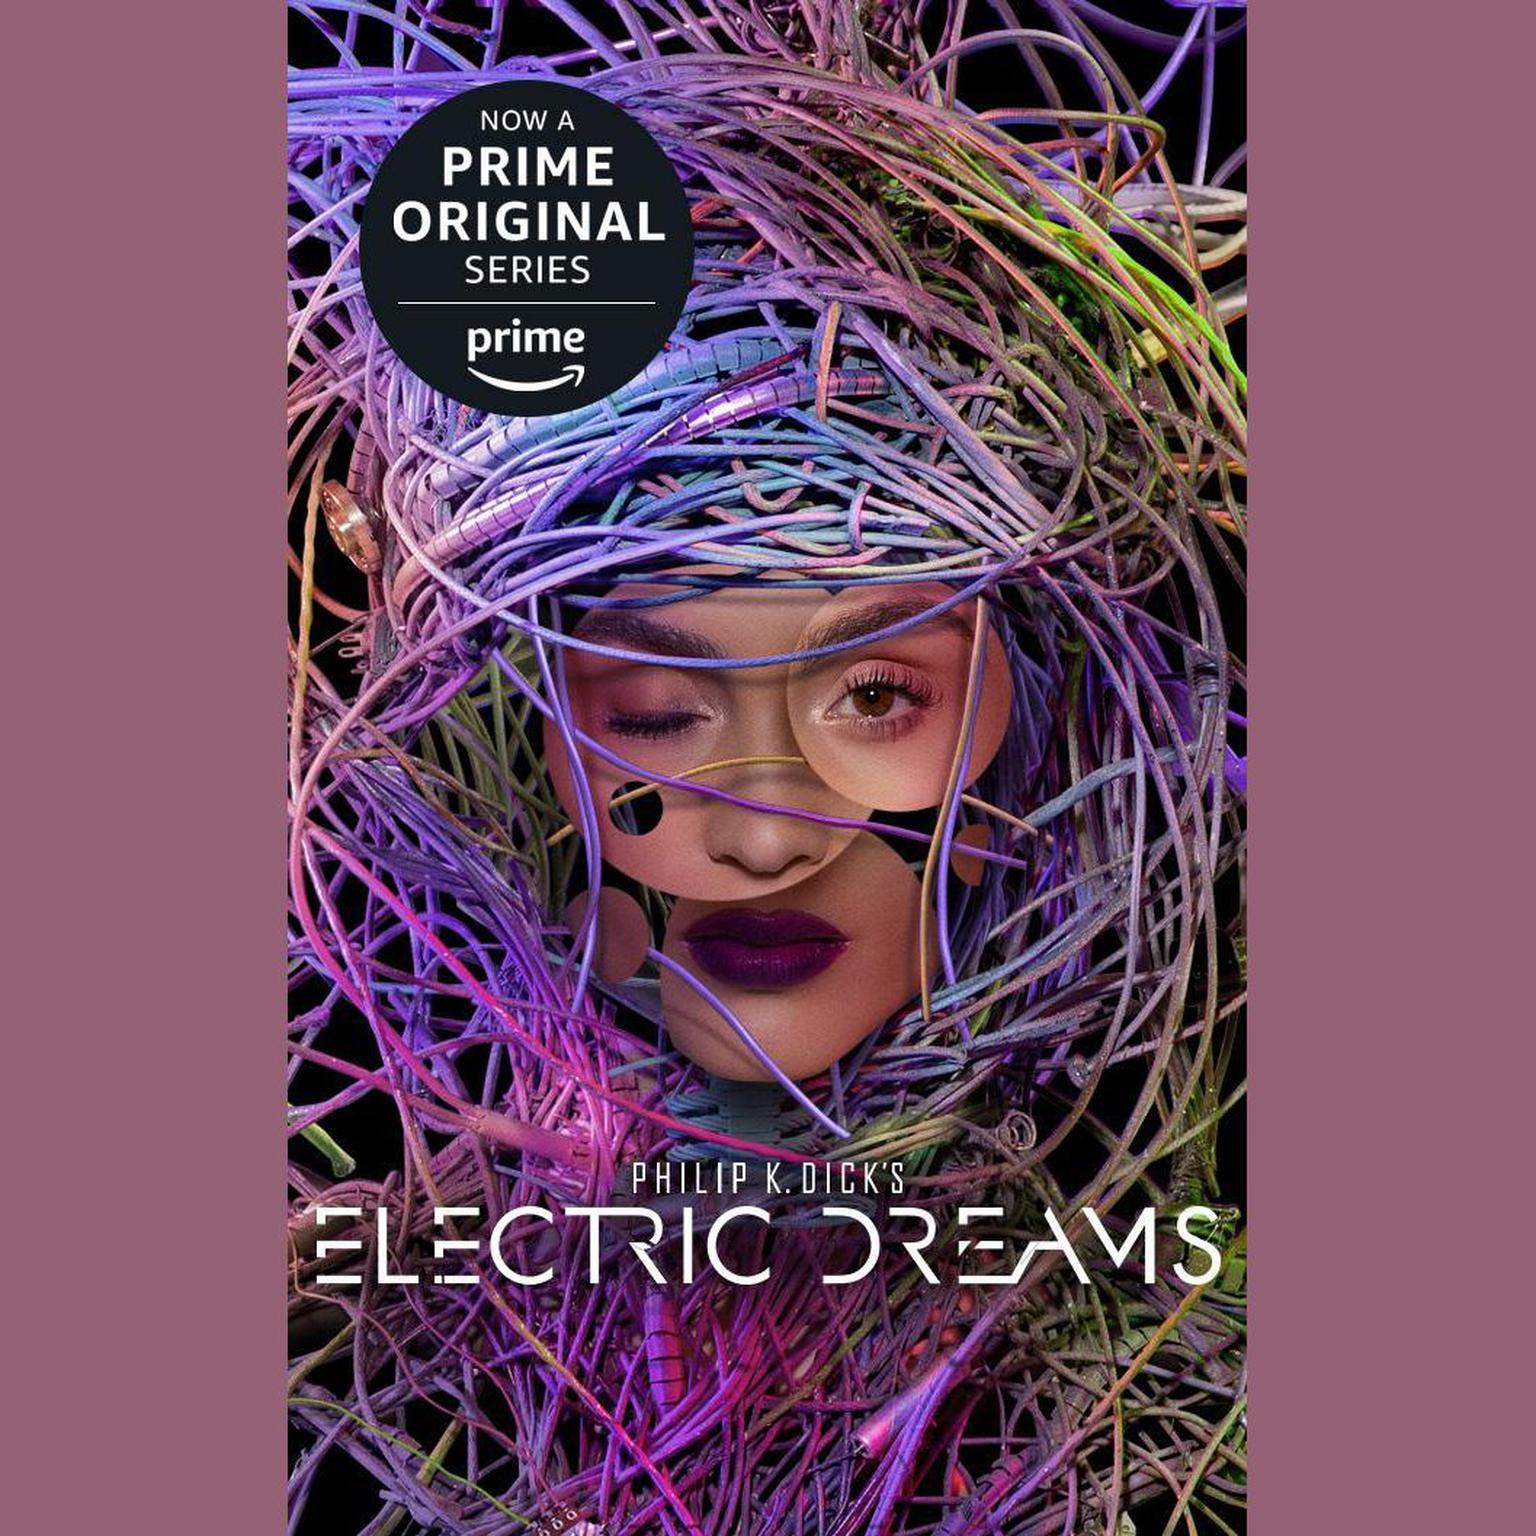 Philip K. Dicks Electric Dreams Audiobook, by Philip K. Dick